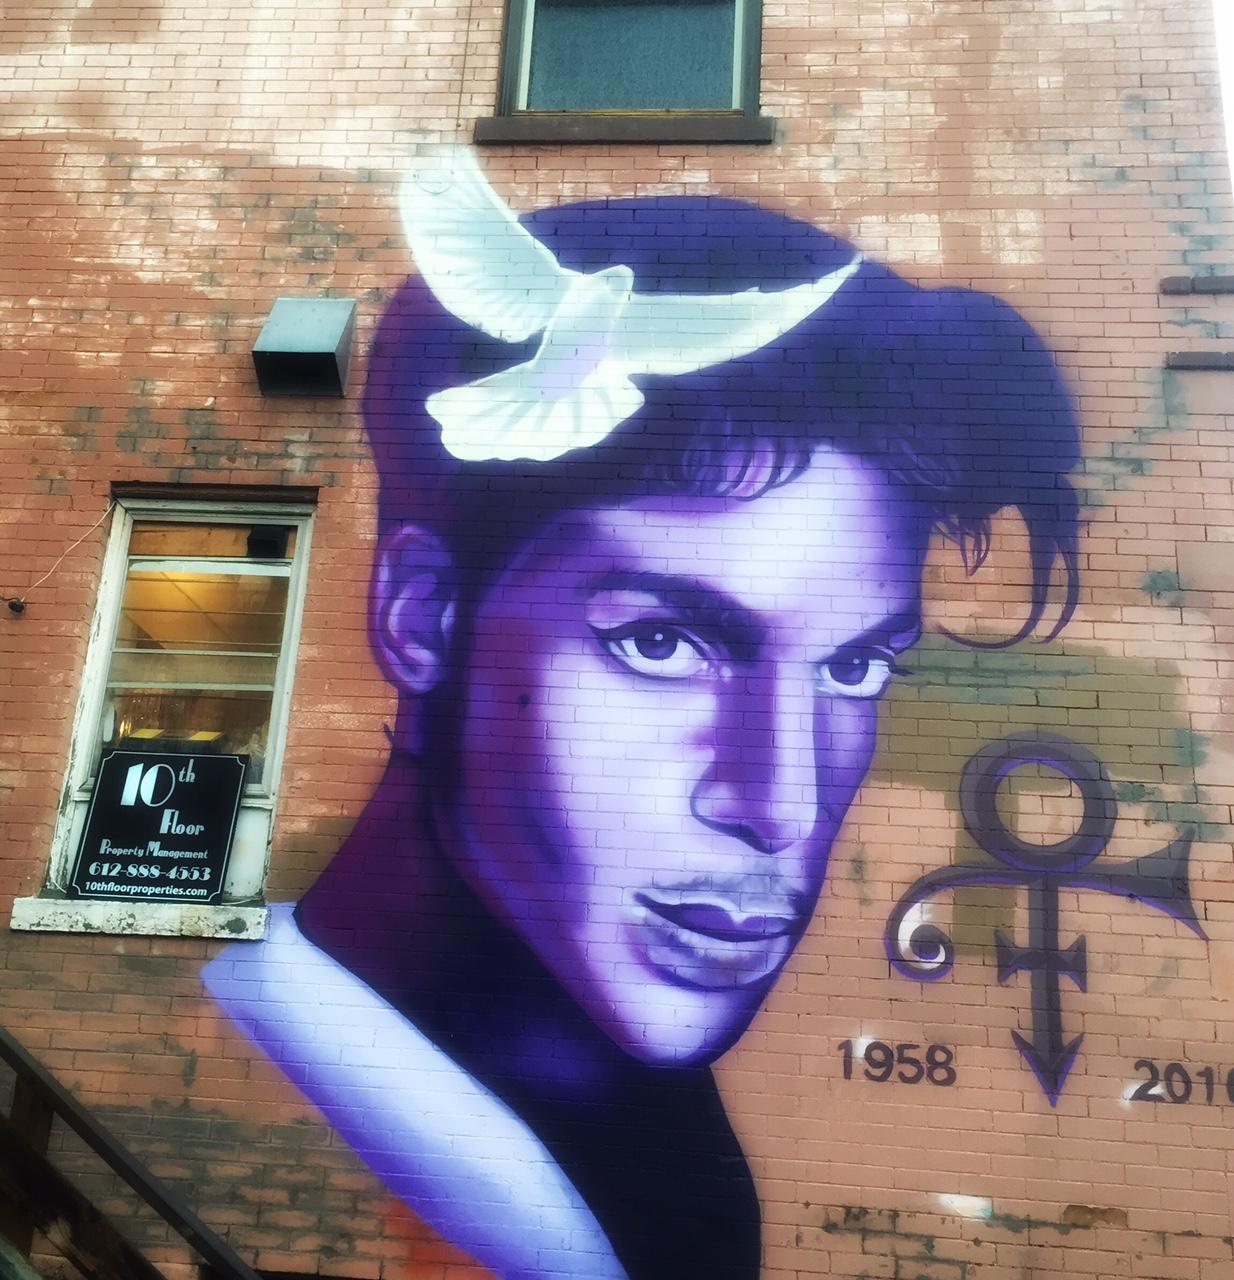 Minnesota rains purple mourning the death of Prince ...